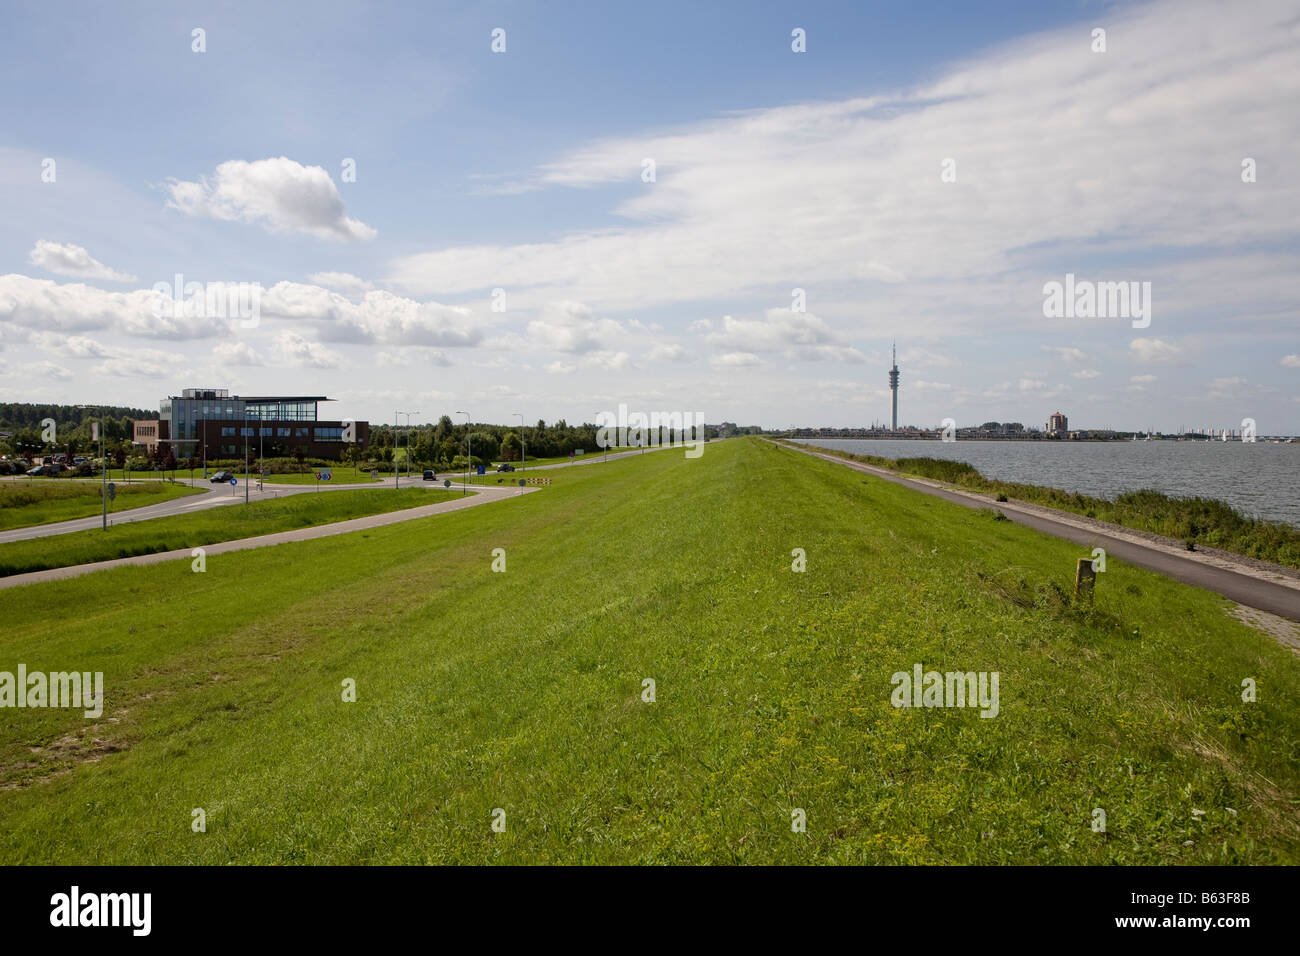 Dyke on reclaimed land protecting Lelystad from the IJsselmeer Flevoland Netherlands Stock Photo